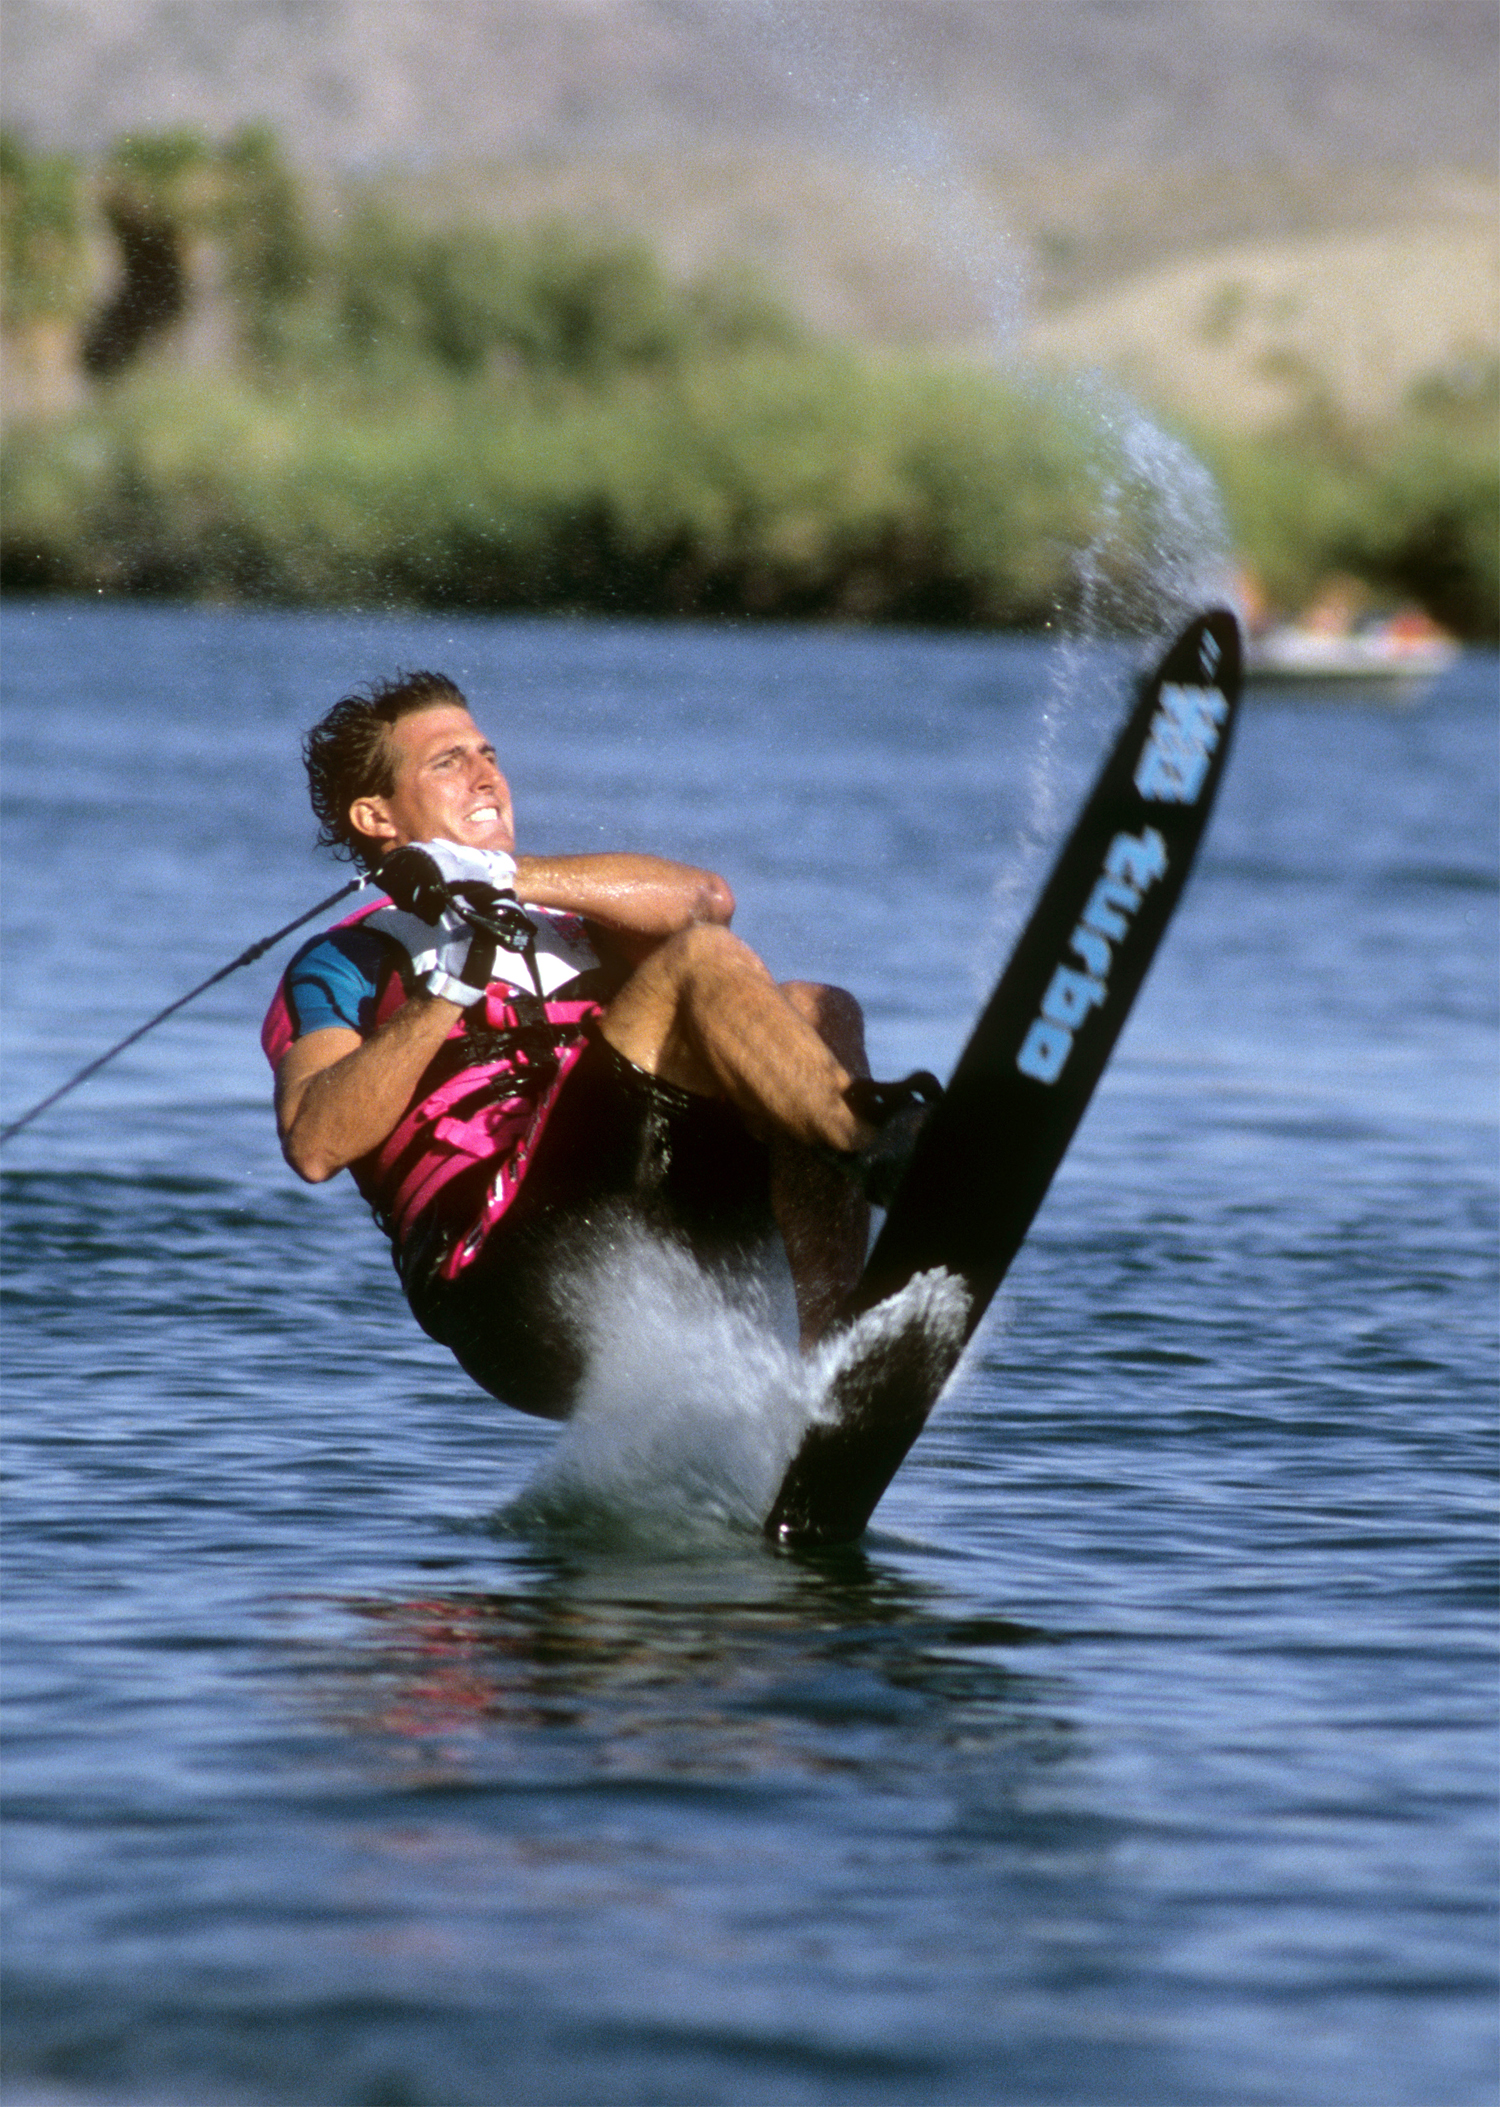 d_TonyKlarich.com_Water_Skiing_FRONTFLIPLAND_HotDog_Creative_Commons_Free_3MR